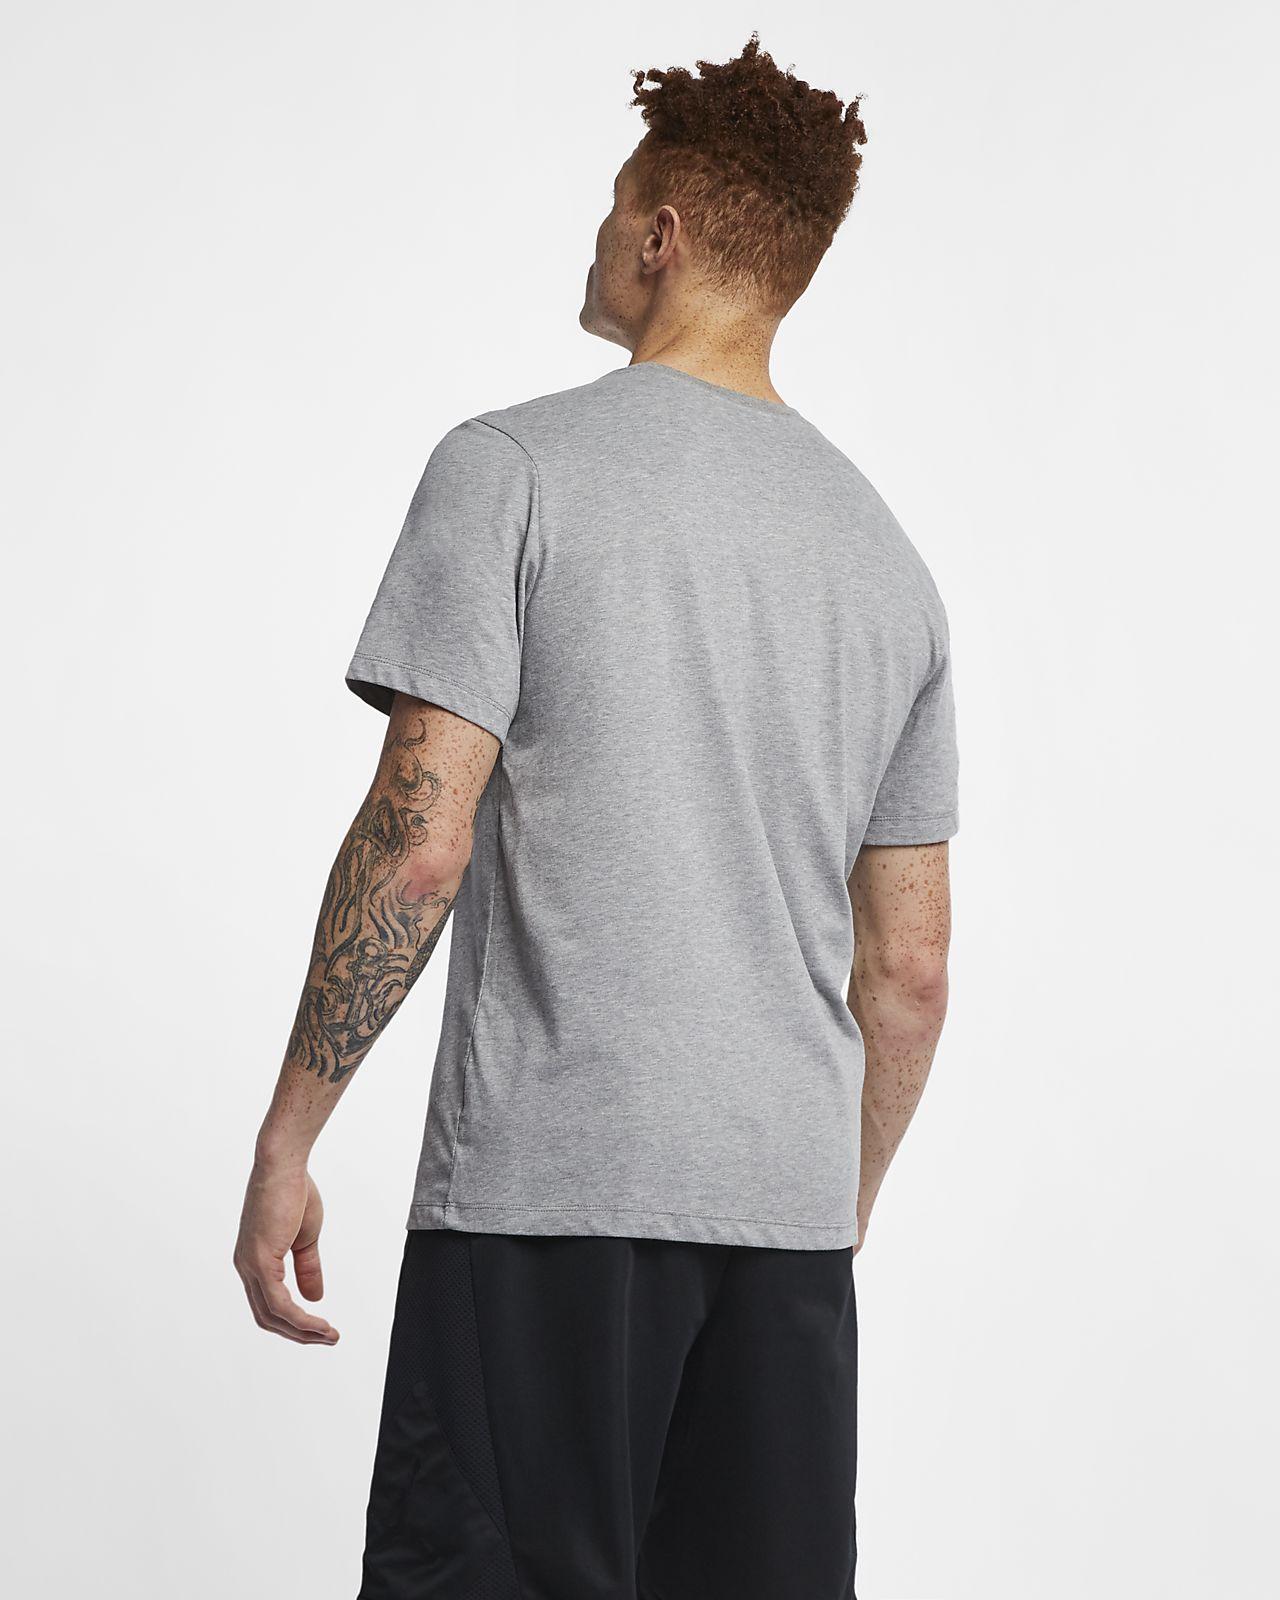 b4fa0bfbc12817 Jordan Iconic 23 7 Men s Training T-Shirt. Nike.com